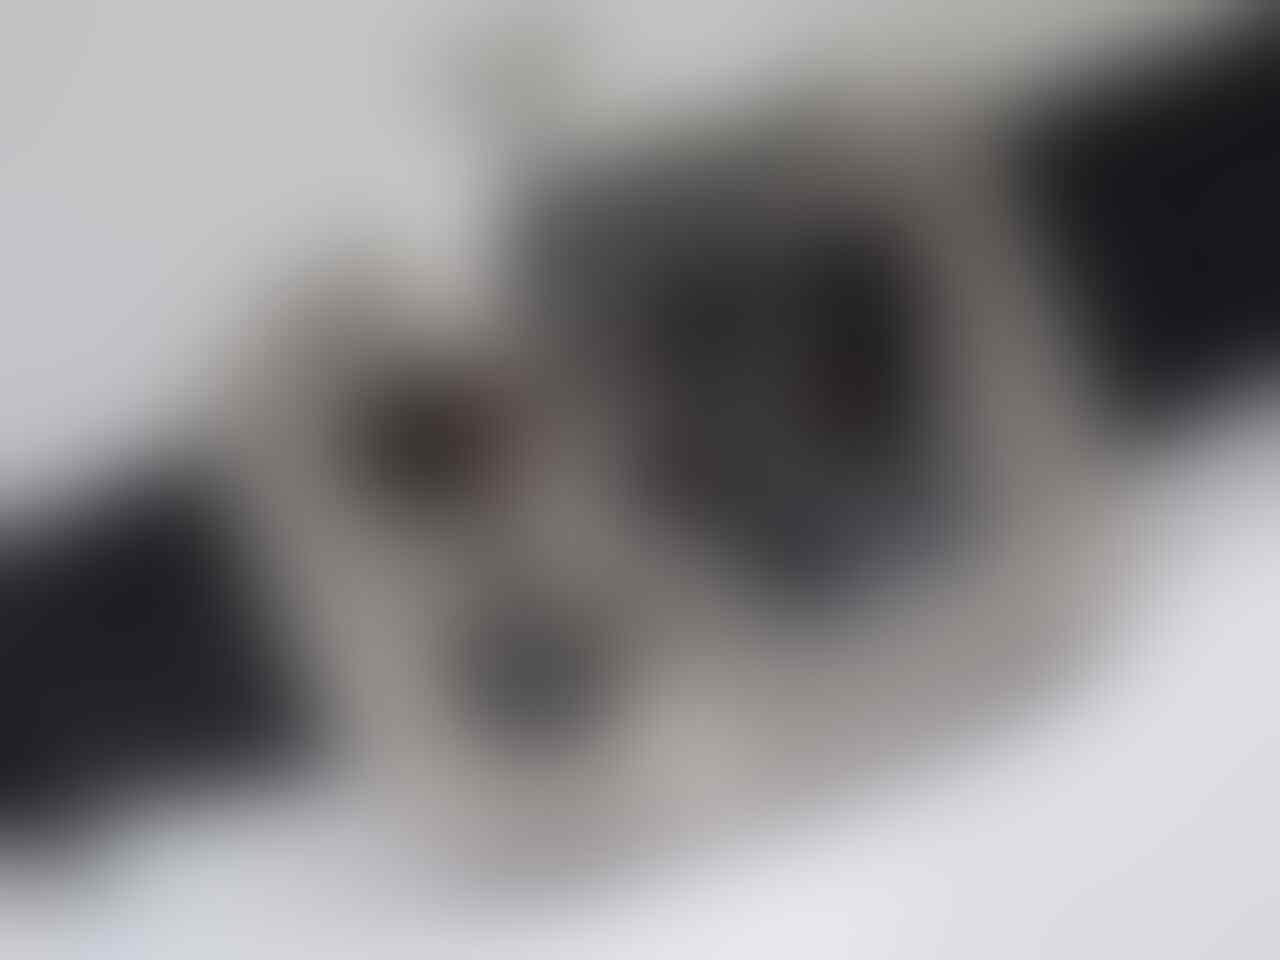 ORIGINAL AZZIMUTH ROBOTO LTD EDITION 500 PIECES